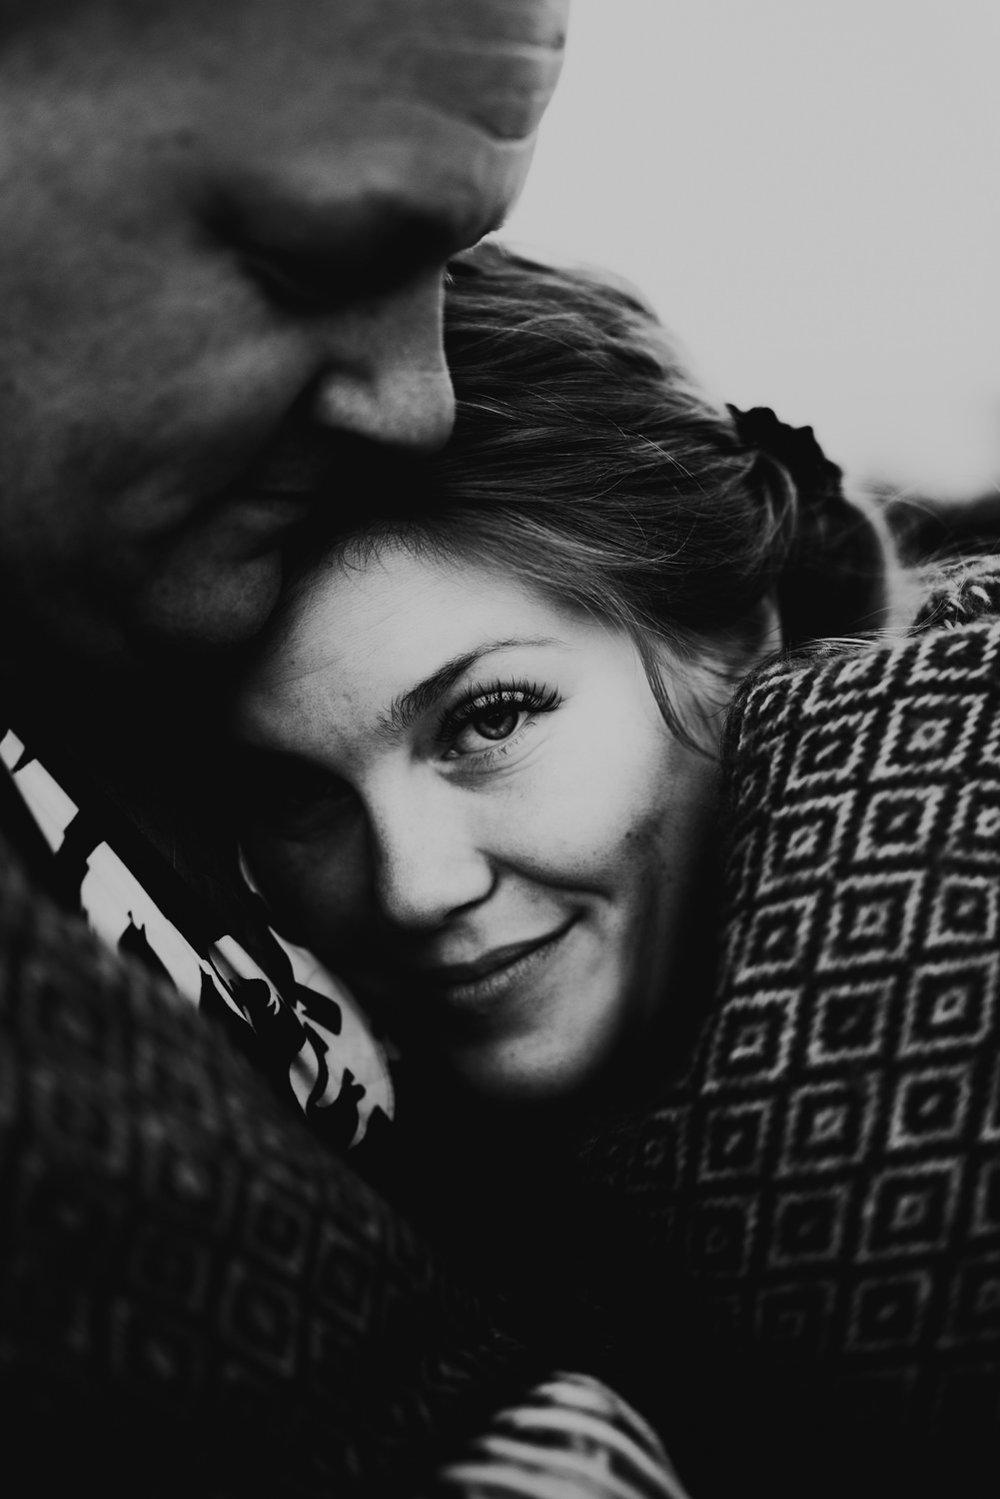 Linnsejphotography-fotograf-brollopsfotograf-brollop-stockholm-yasuragi-elopement-sweden-hemligt-brollop-borgerlig-vinterbrollop-vinter-brollopsinspiration--0033.jpg